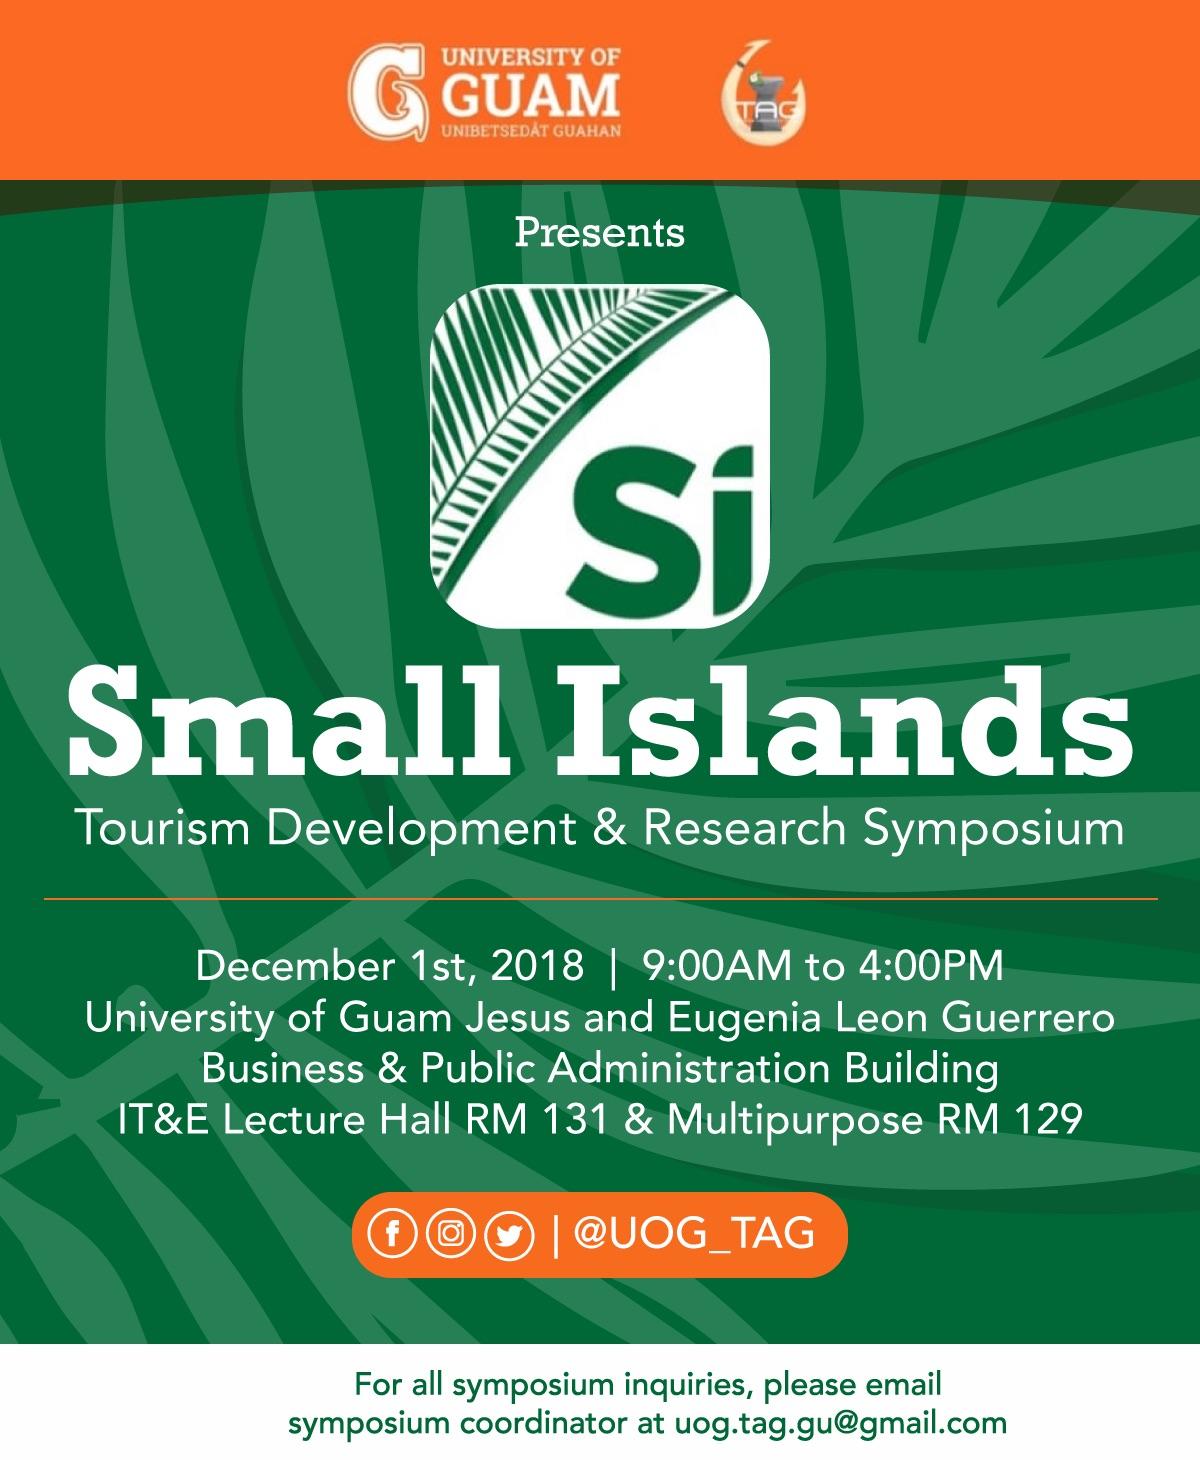 Small Islands Tourism Development & Research Symposium